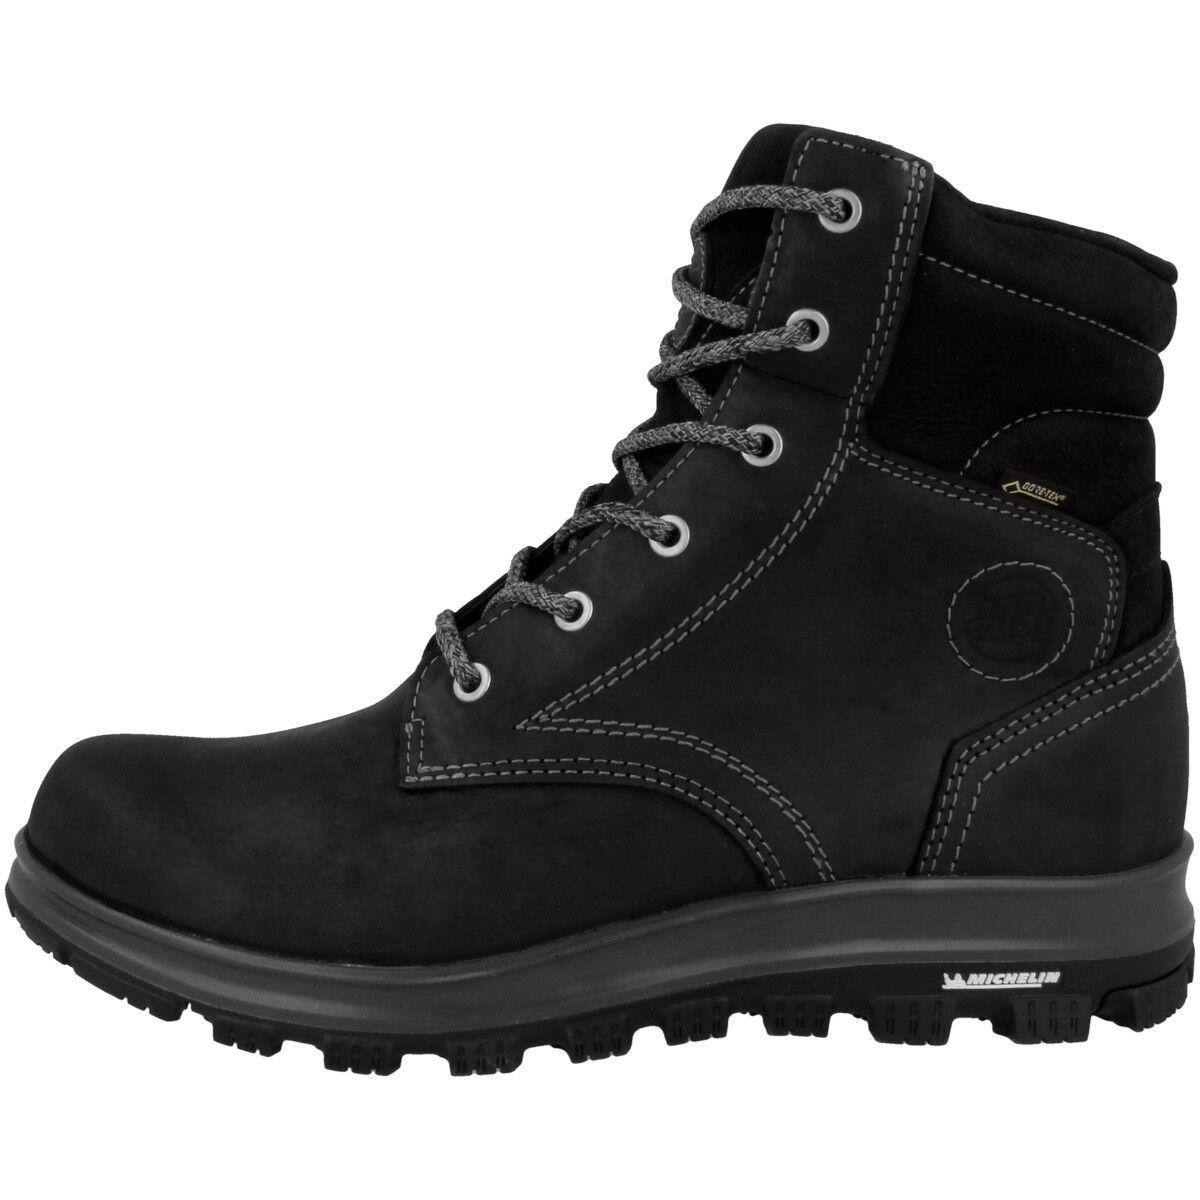 Hanwag Anvik GTX Men Outdoor Schuhe Herren Gore-Tex Casual Stiefel schwarz 44260-12    | Überlegene Qualität